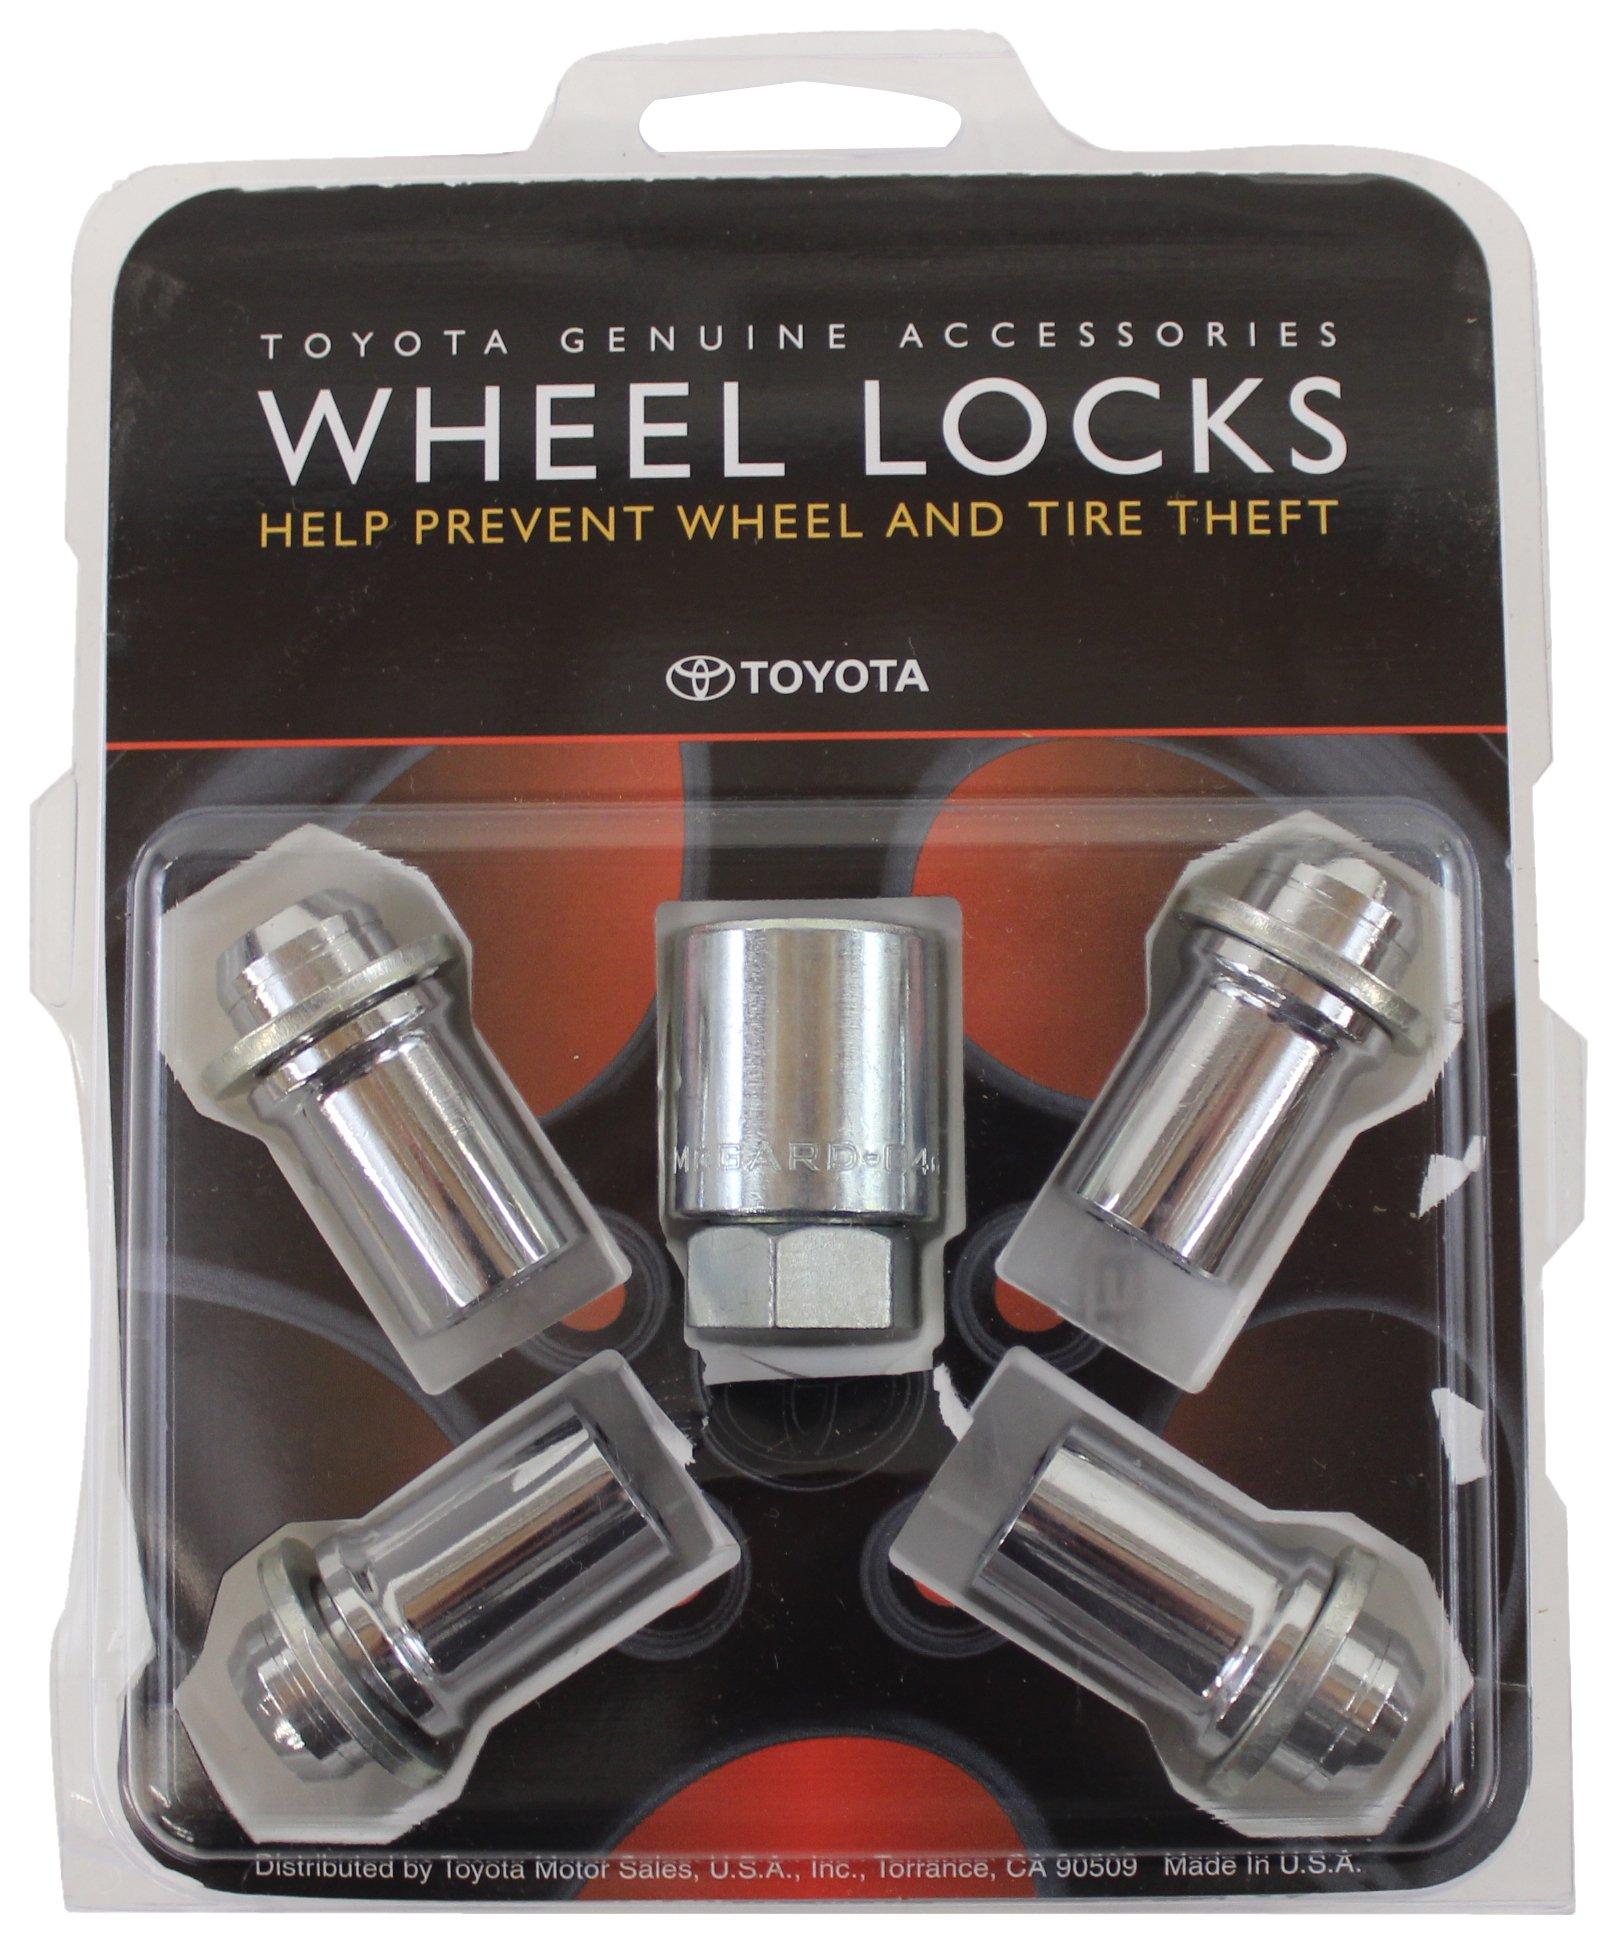 TOYOTA Genuine Accessories 00276-00901 Wheel Lock by TOYOTA